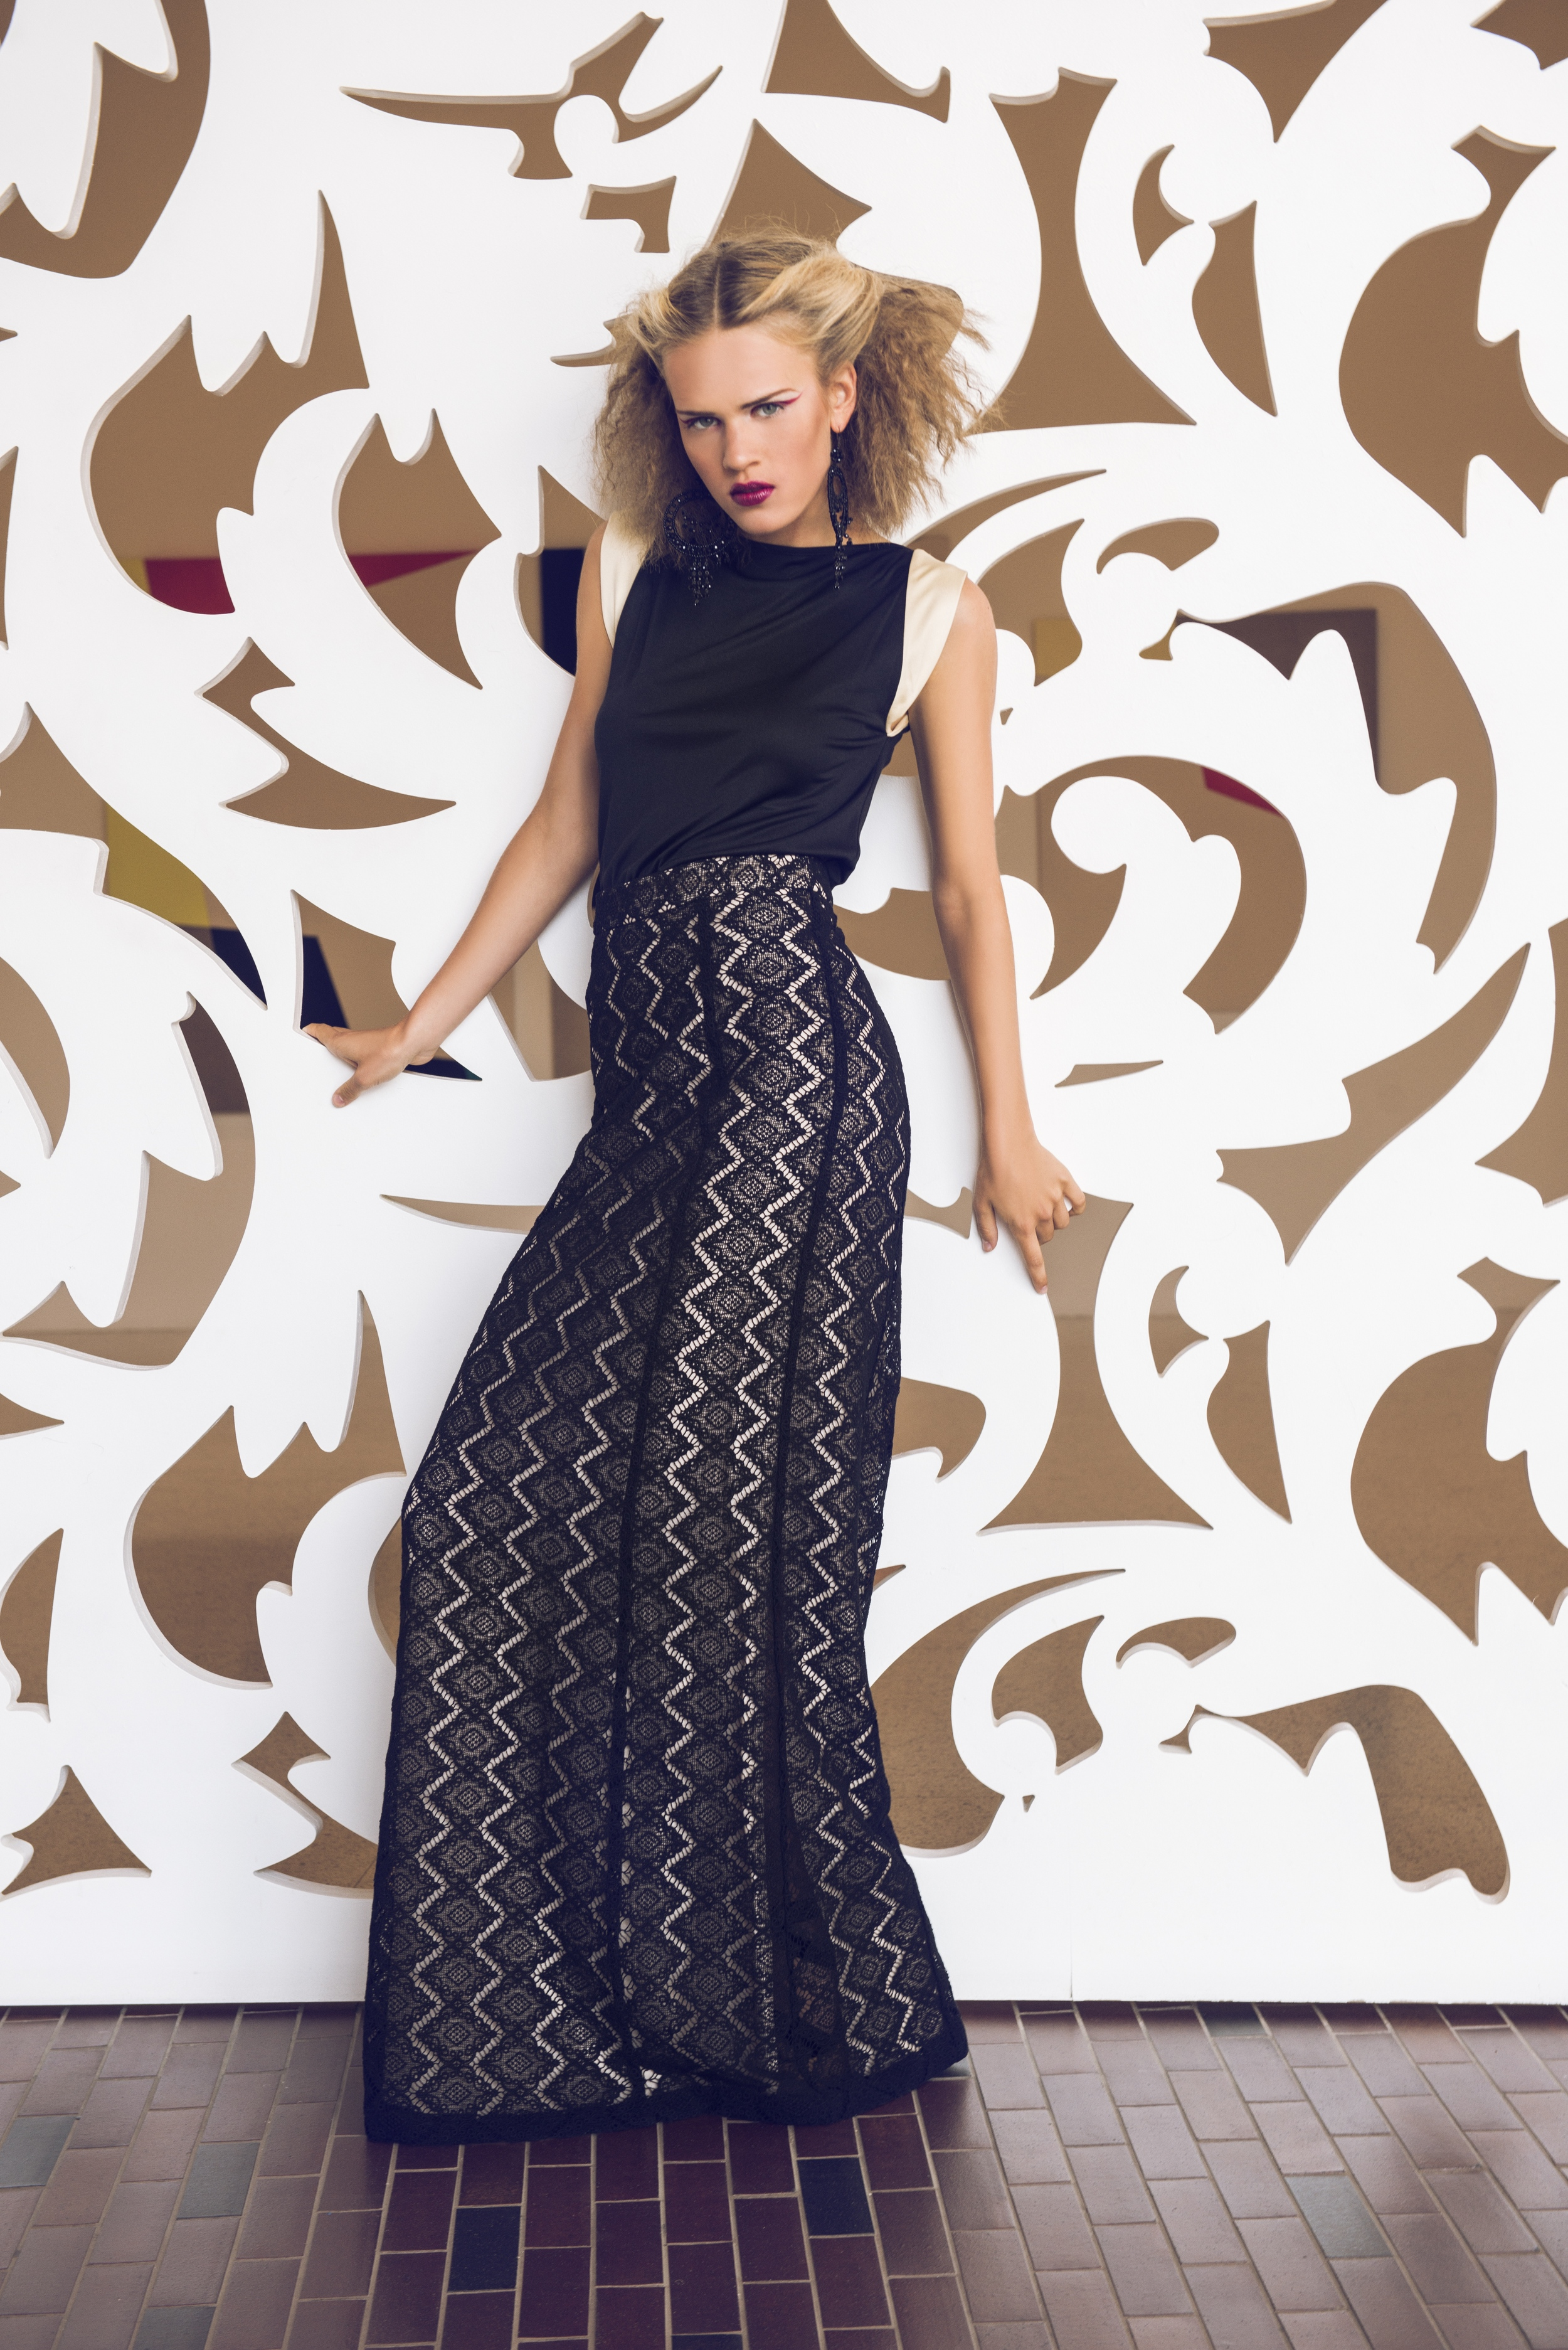 Designer:  Cocoon by Elizabeth Geisler